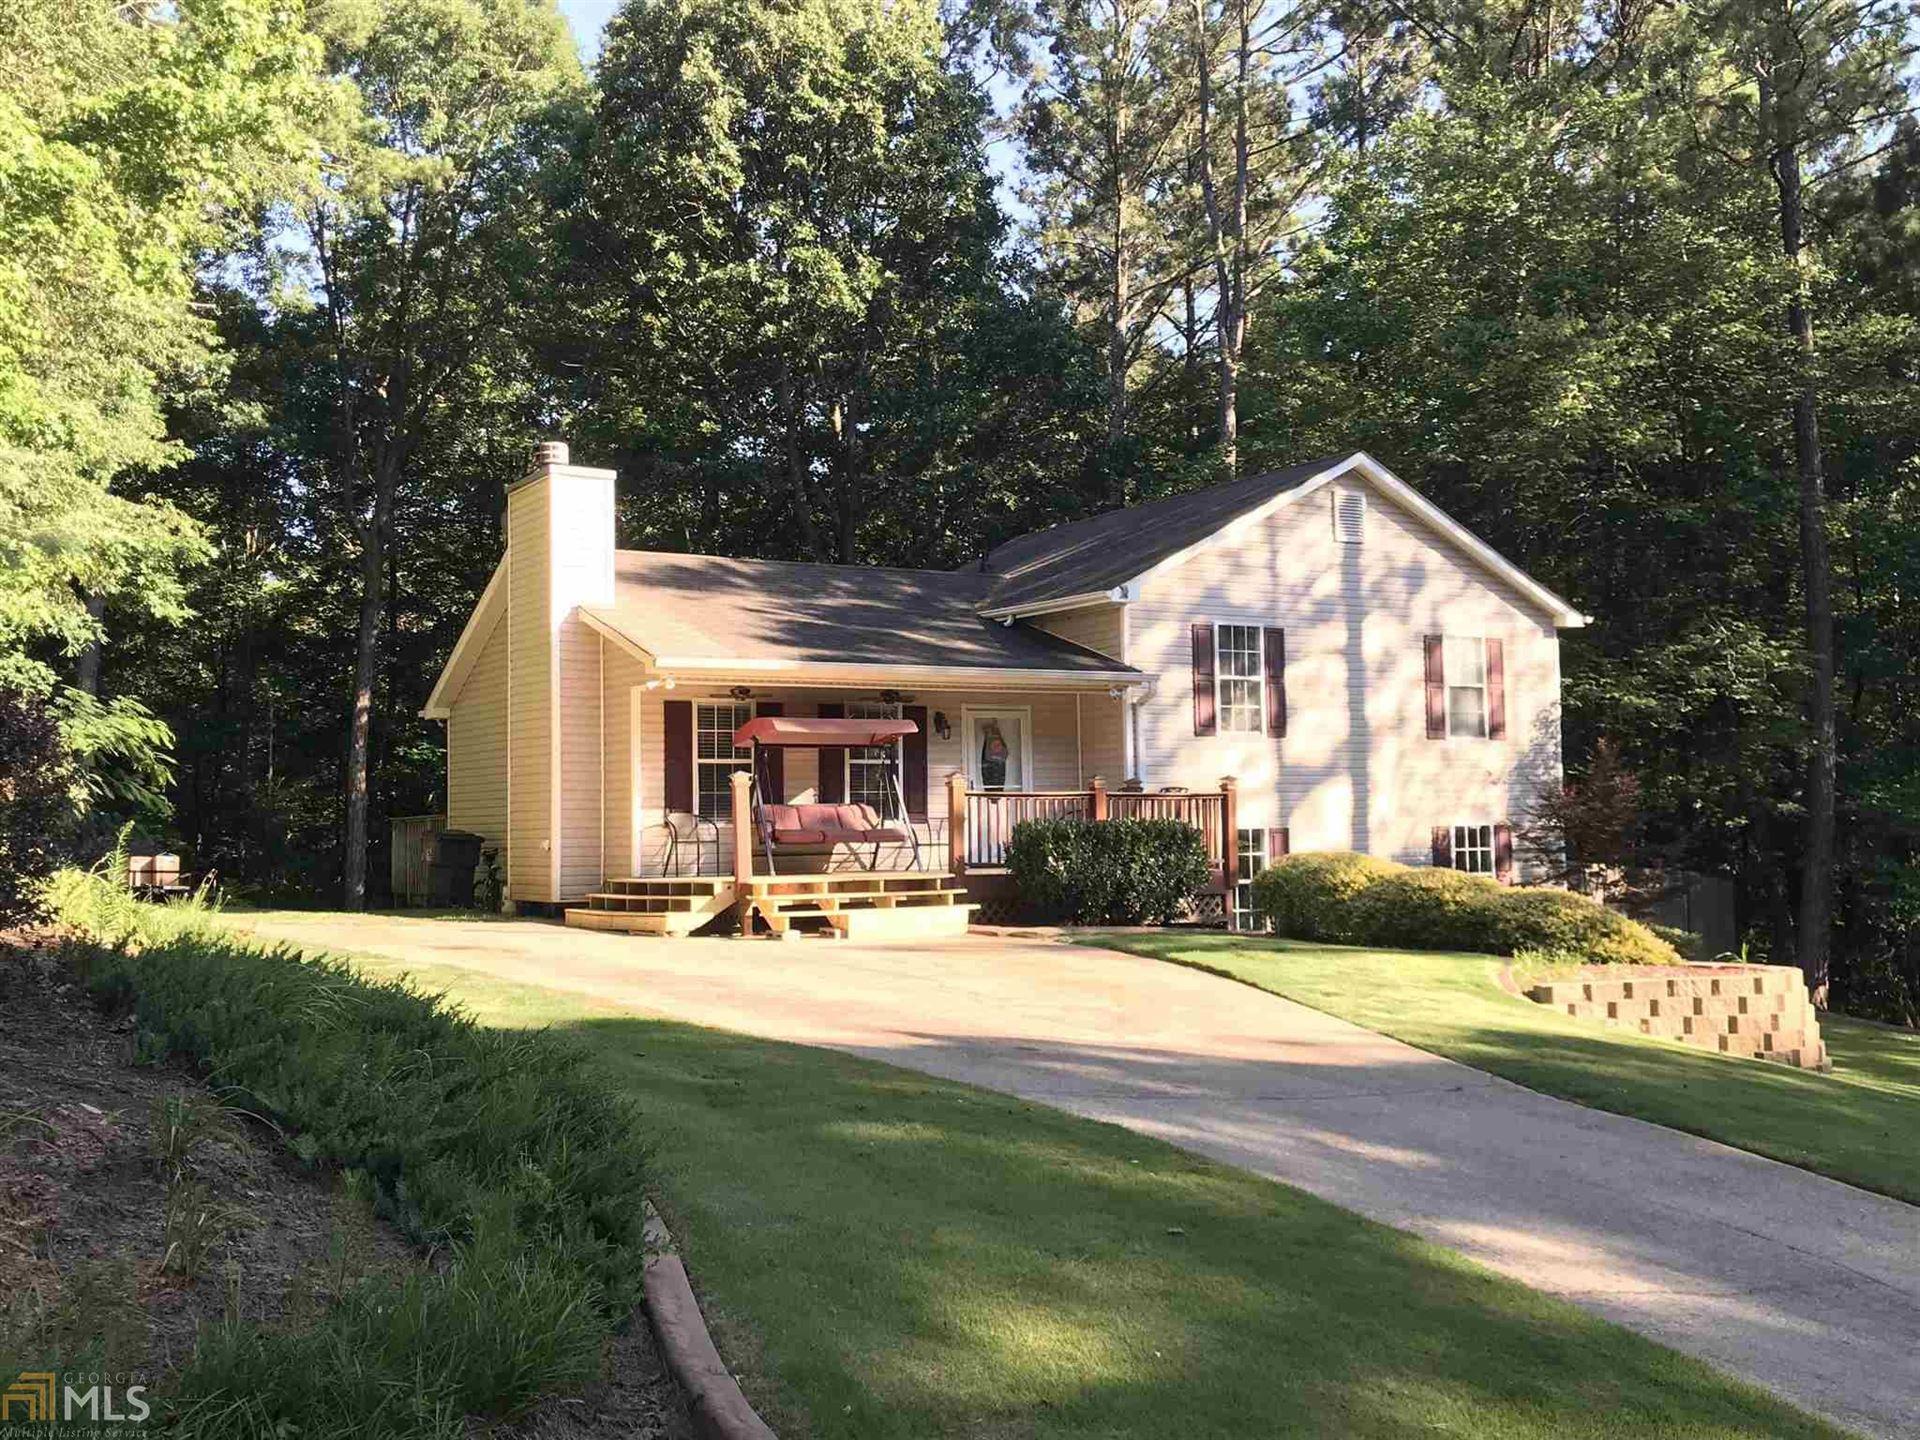 148 Bobolink Dr, Monticello, GA 31064 - MLS#: 8999198